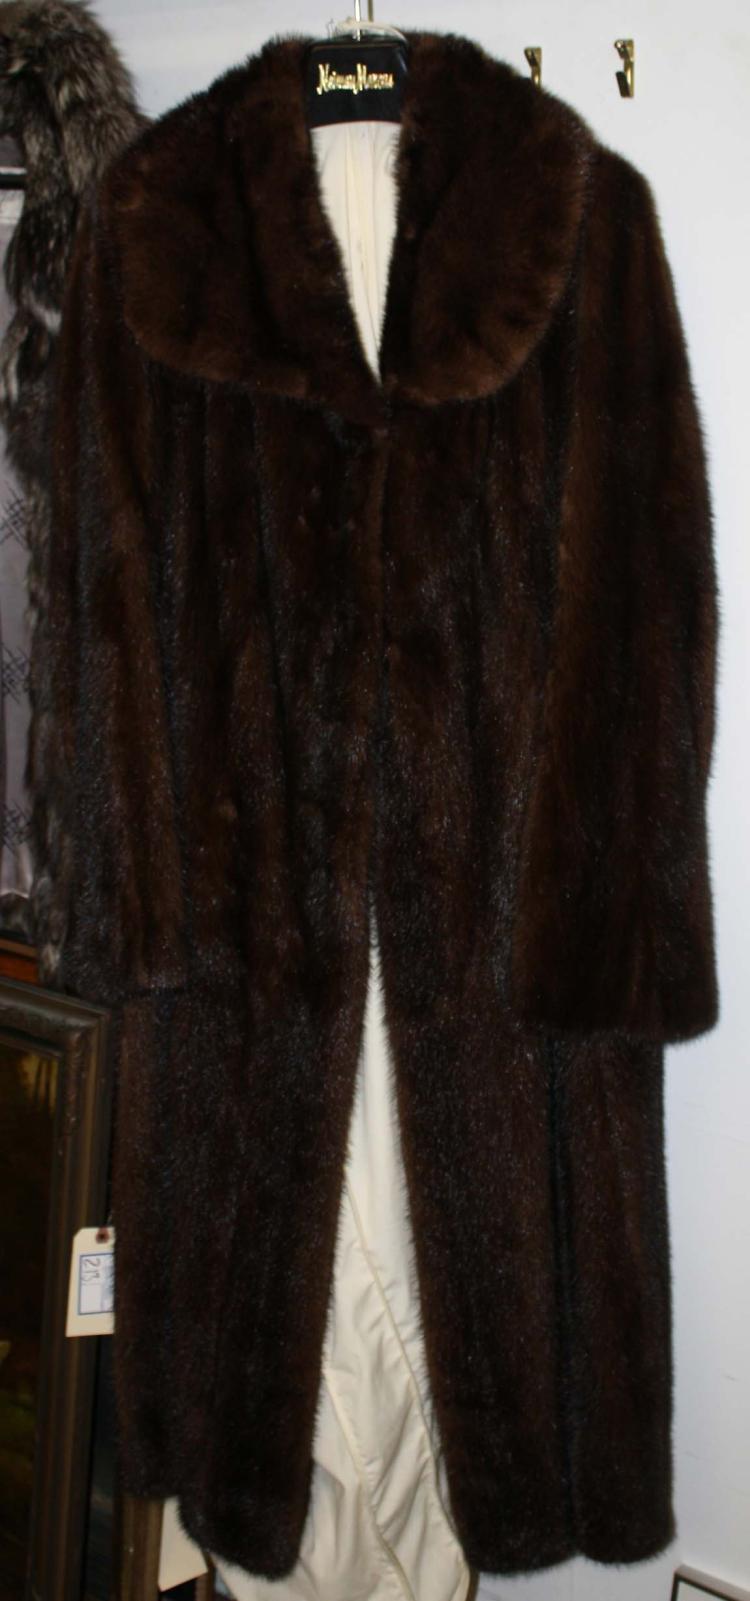 neiman marcus labeled full length mink coat. Black Bedroom Furniture Sets. Home Design Ideas